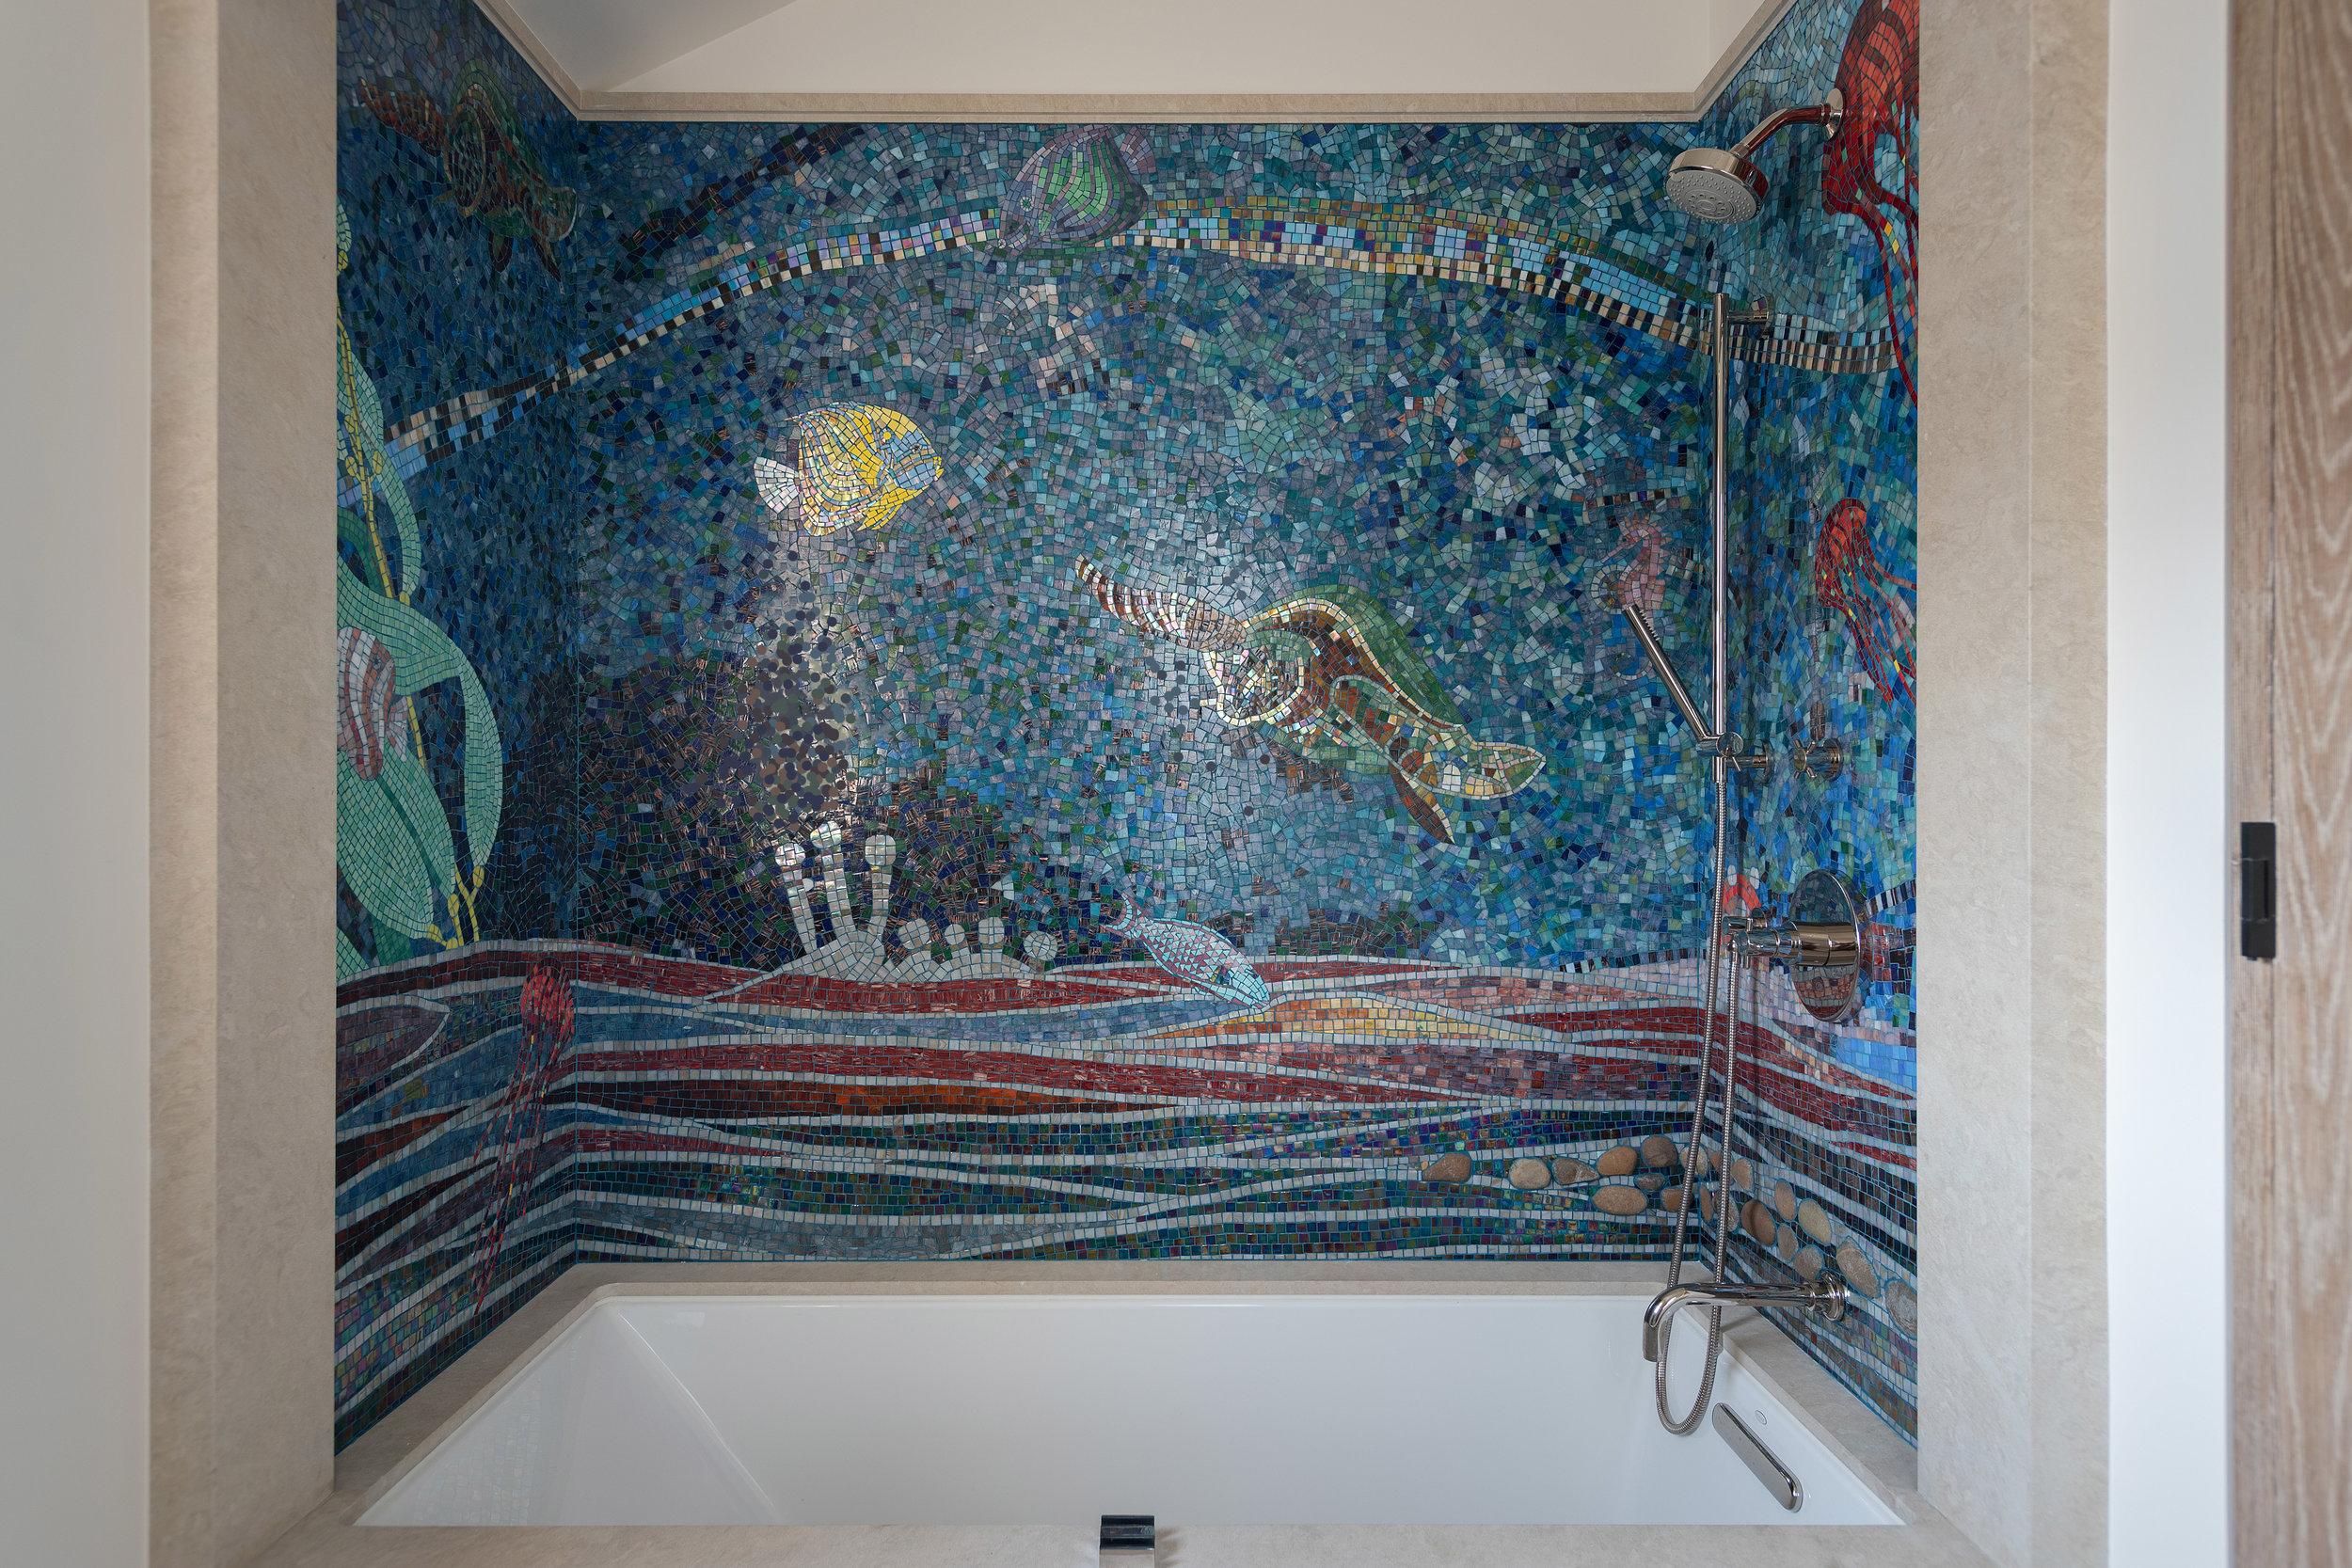 Mosaic Bunk Bath_Balboa_editedDSC5707.jpg